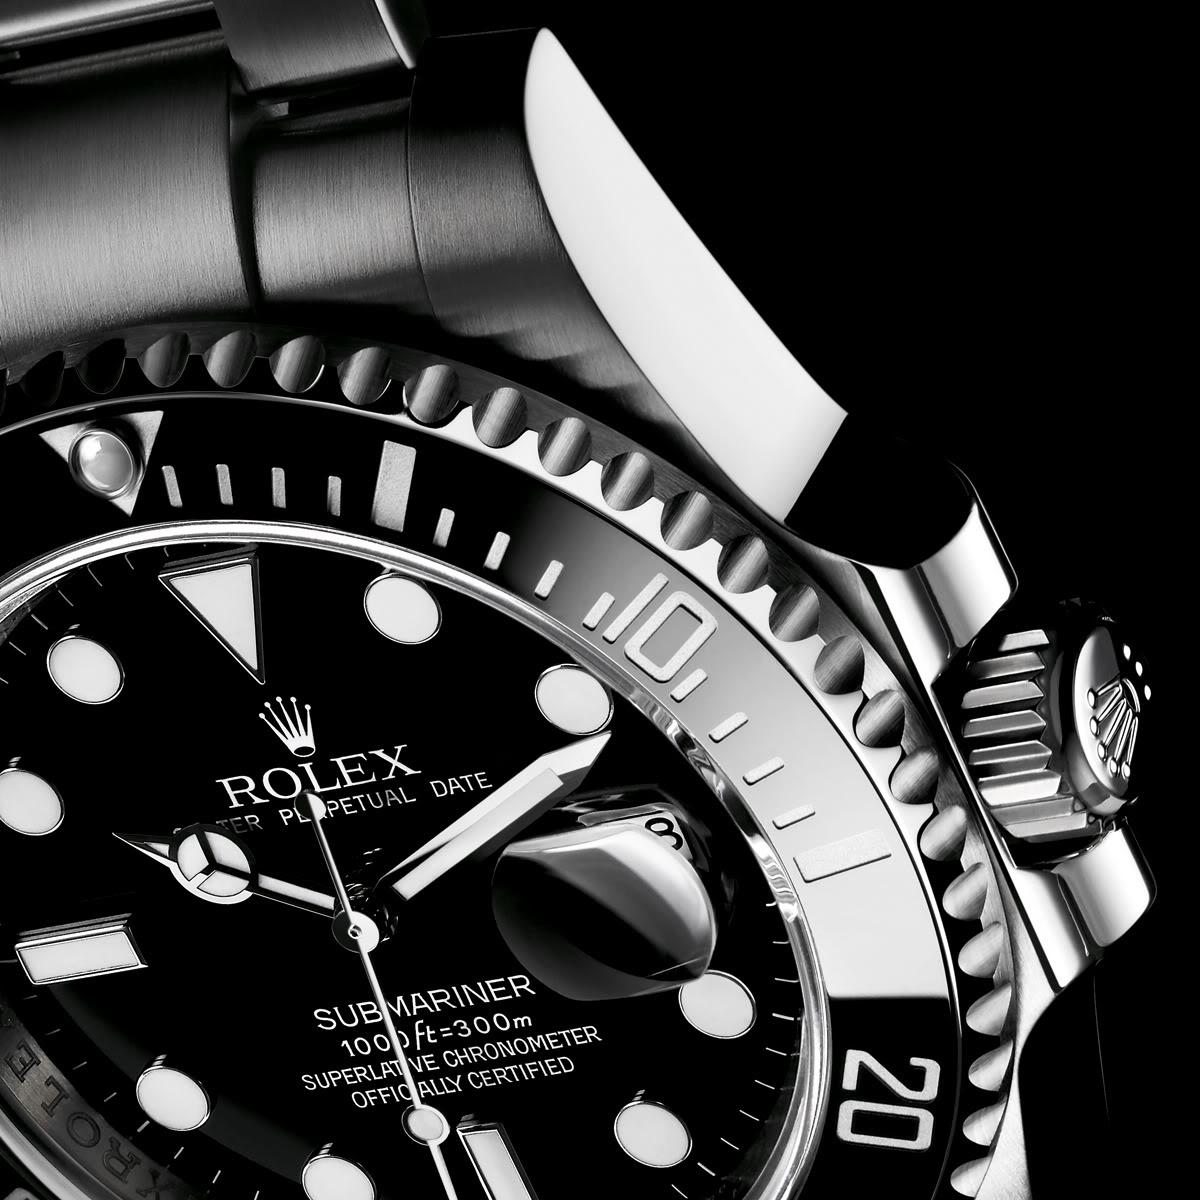 [nouveauté] Rolex submariner SUBMARINER-DATE_3